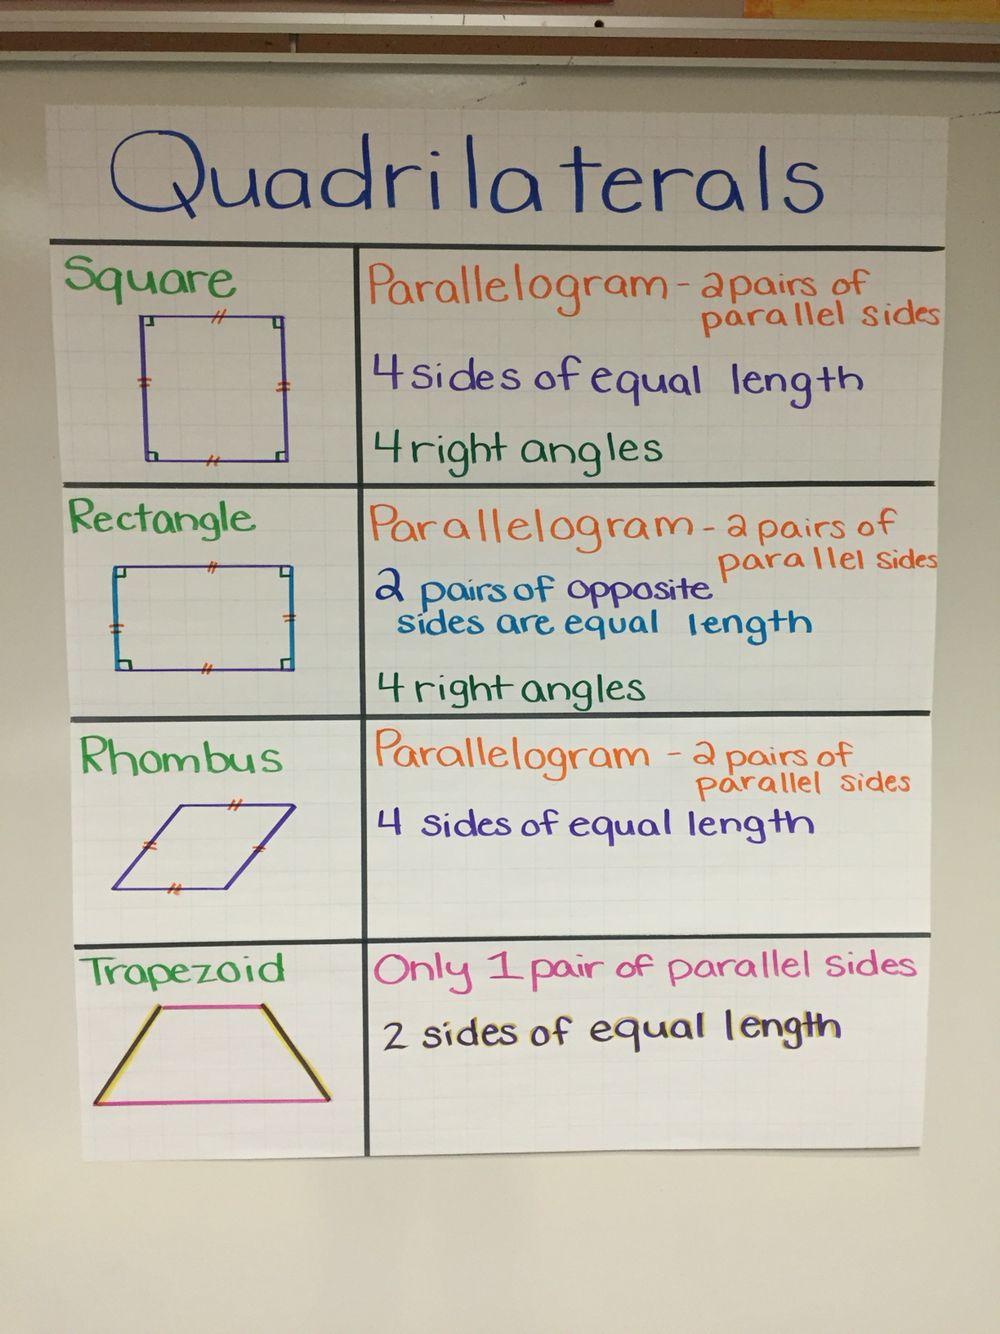 Describing attributes of quadrilaterals (3rd grade)